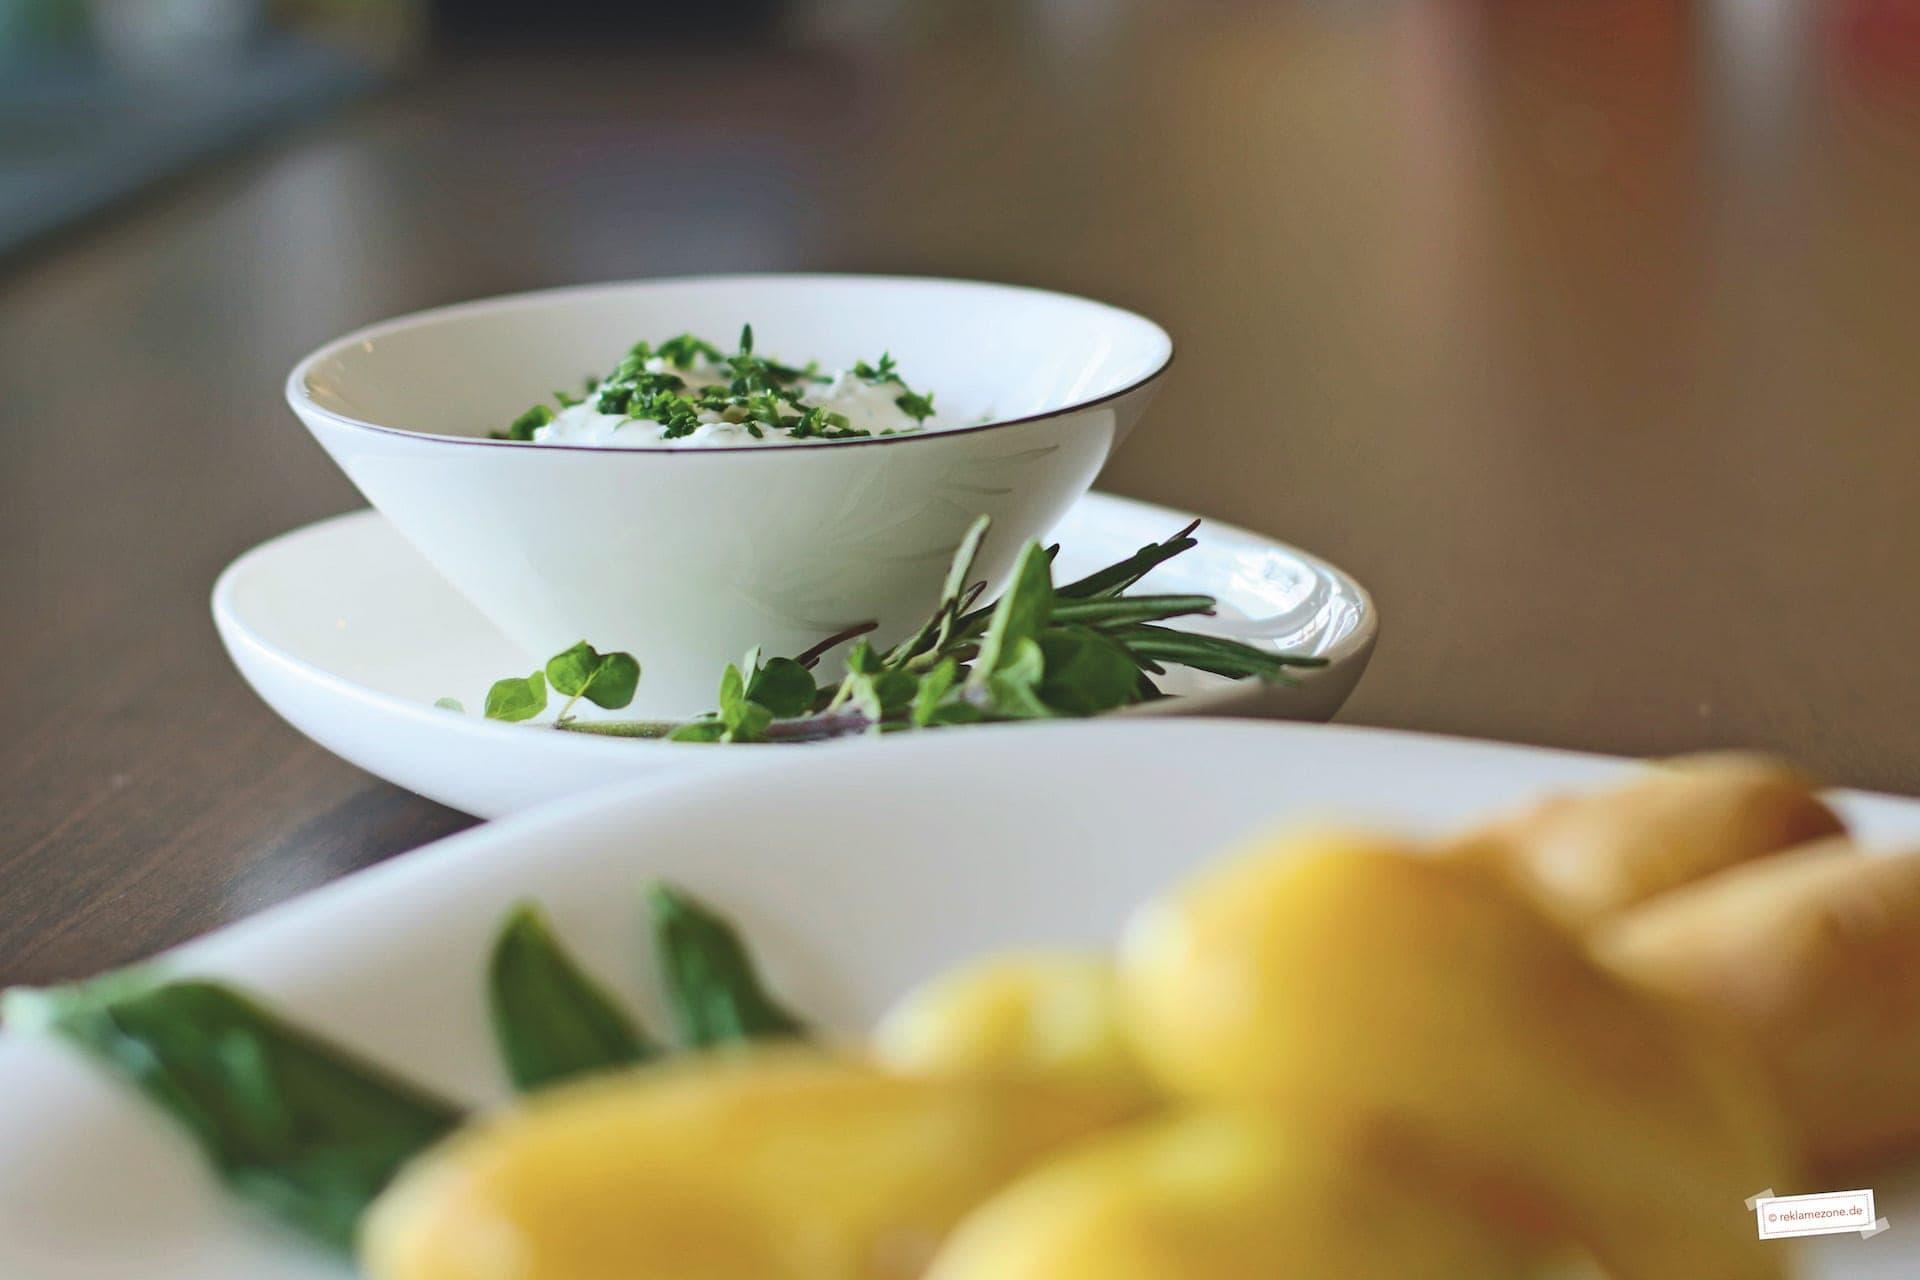 Kartoffelgerichte, Pellkartoffeln mit Kräuterquark - Foto: reklamezone.de